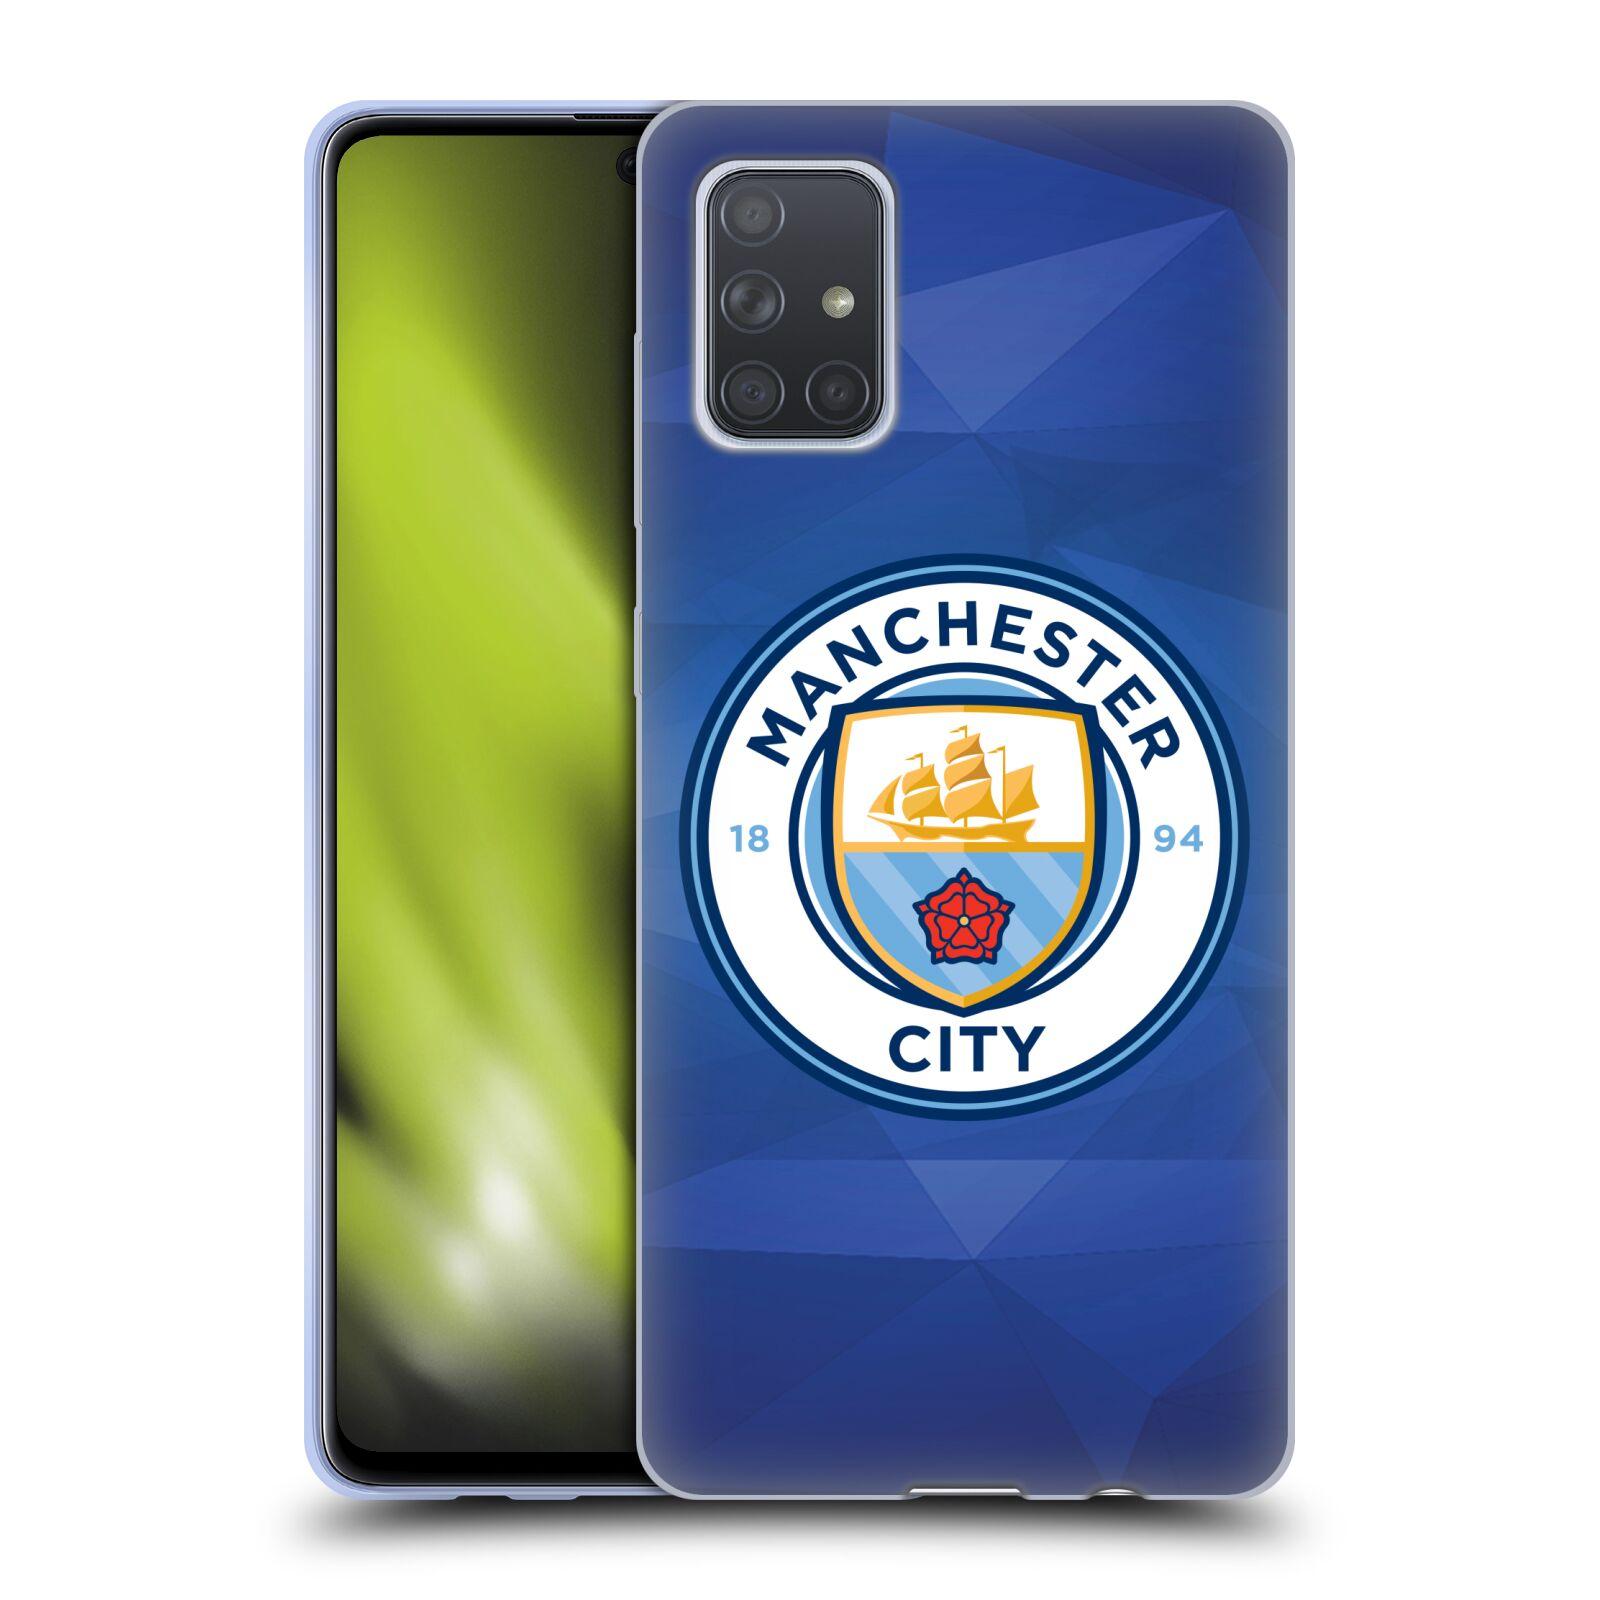 Silikonové pouzdro na mobil Samsung Galaxy A71 - Head Case - Manchester City FC - Modré nové logo